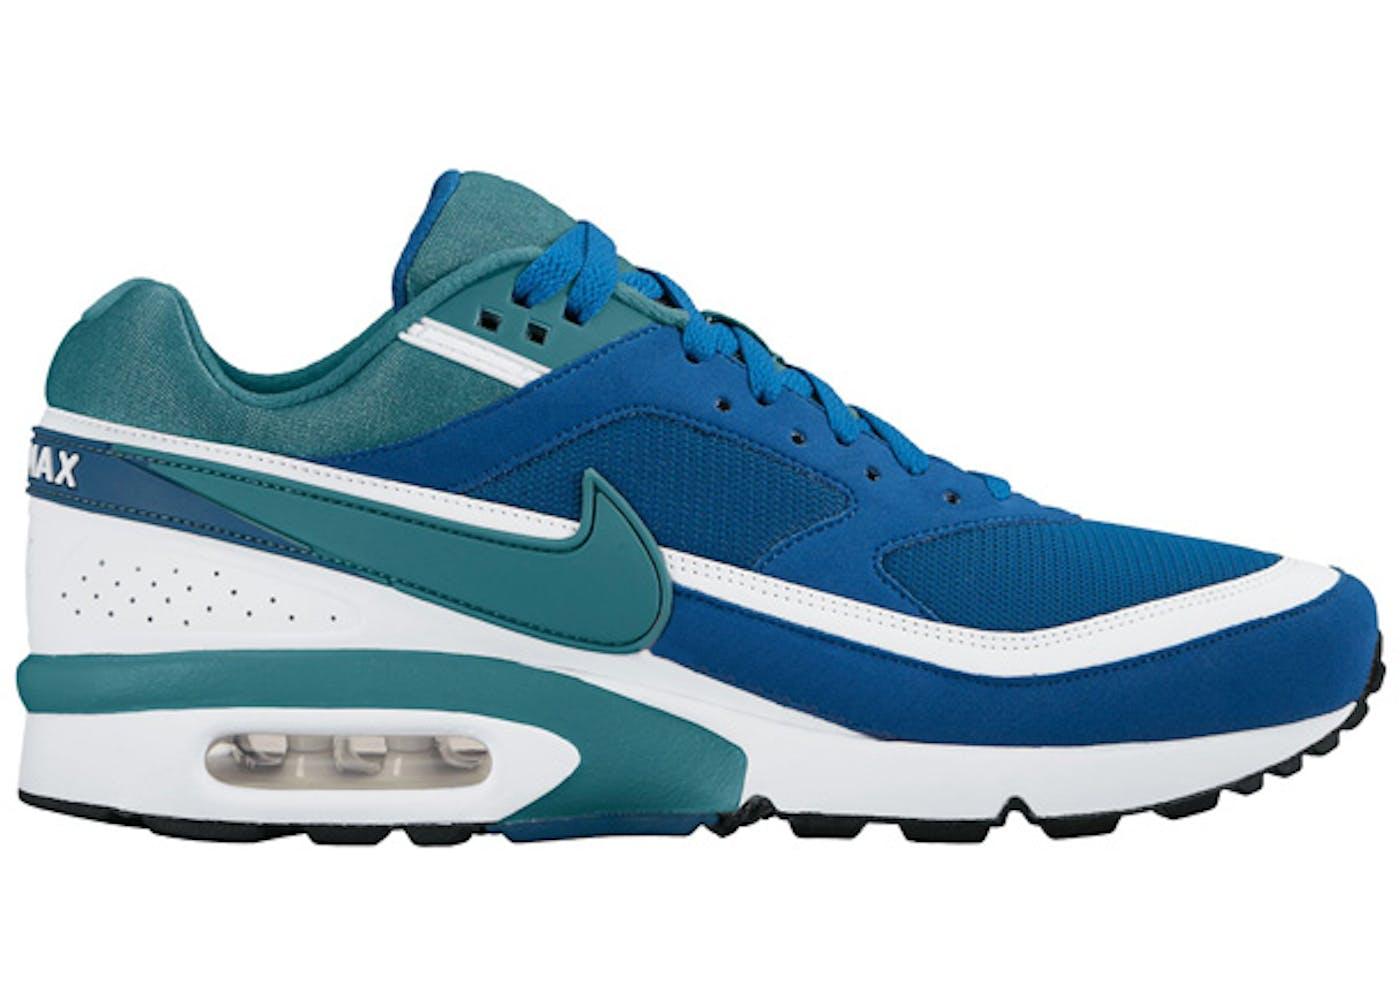 d470c59354 ... Air Max BW Marina Blue (2016) Nike ...